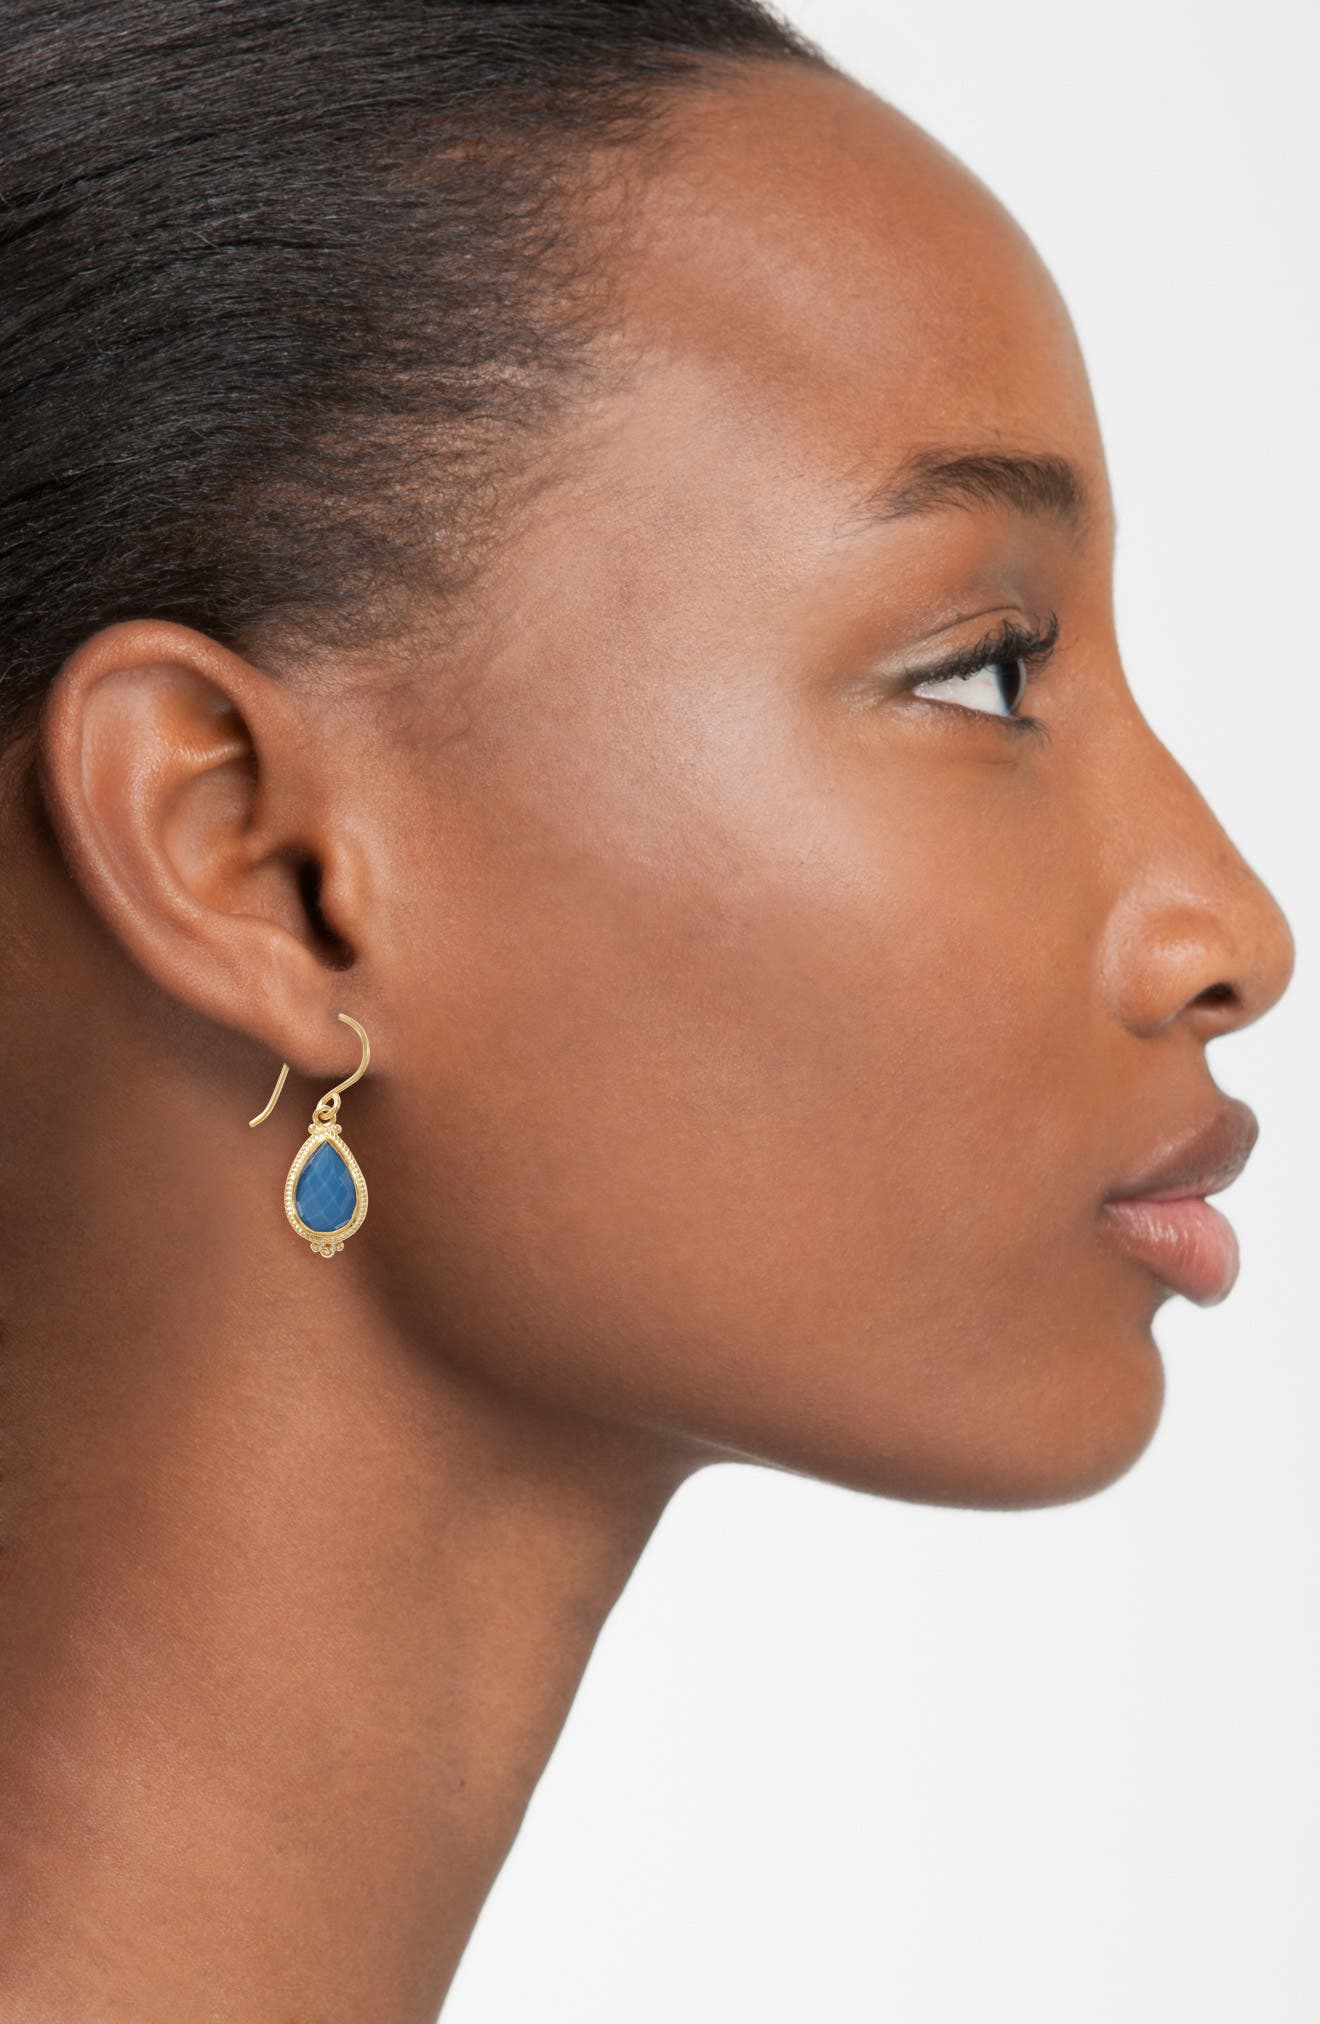 Blue Quartz Small Teardrop Earrings,                             Alternate thumbnail 2, color,                             400